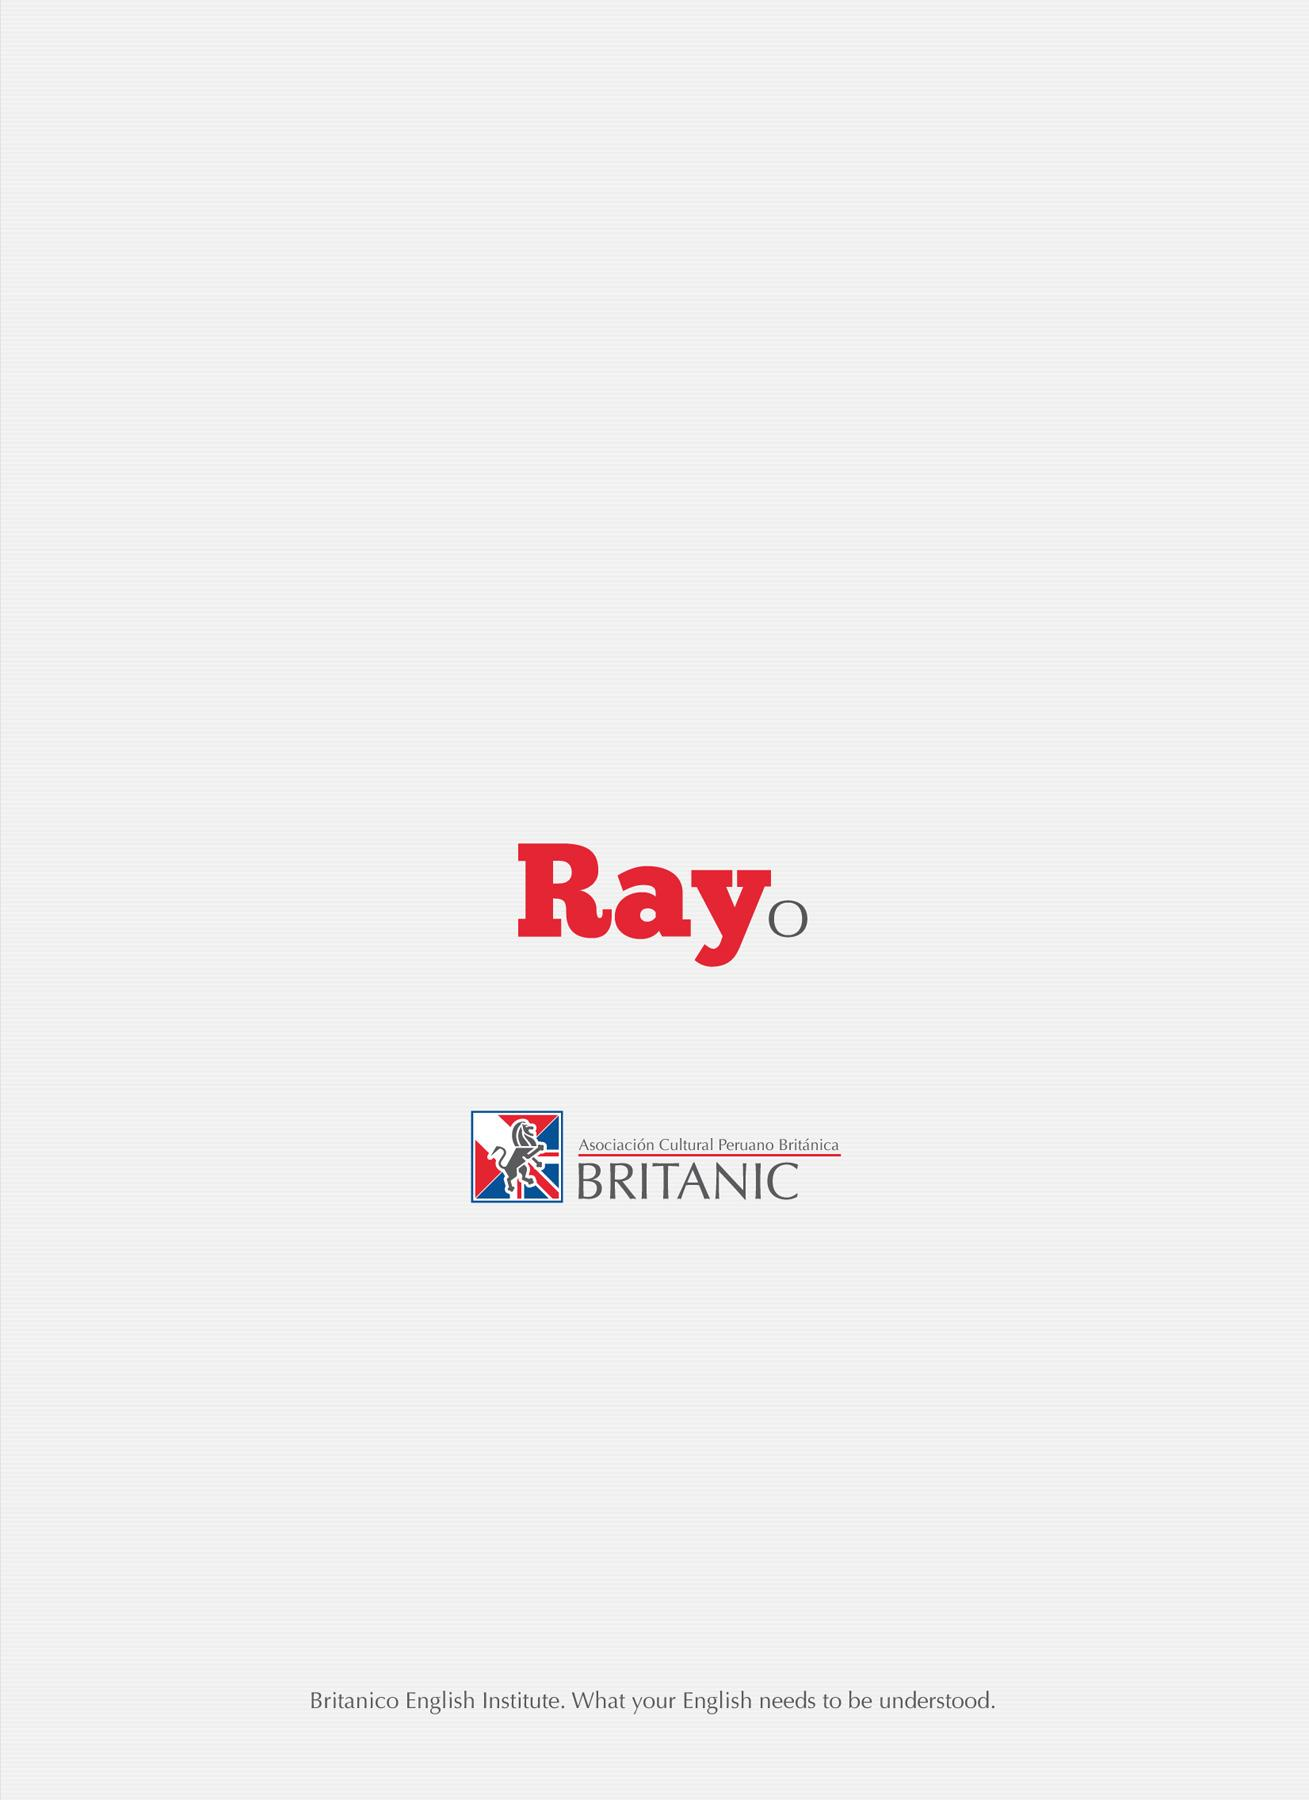 Británico Print Ad -  Ray